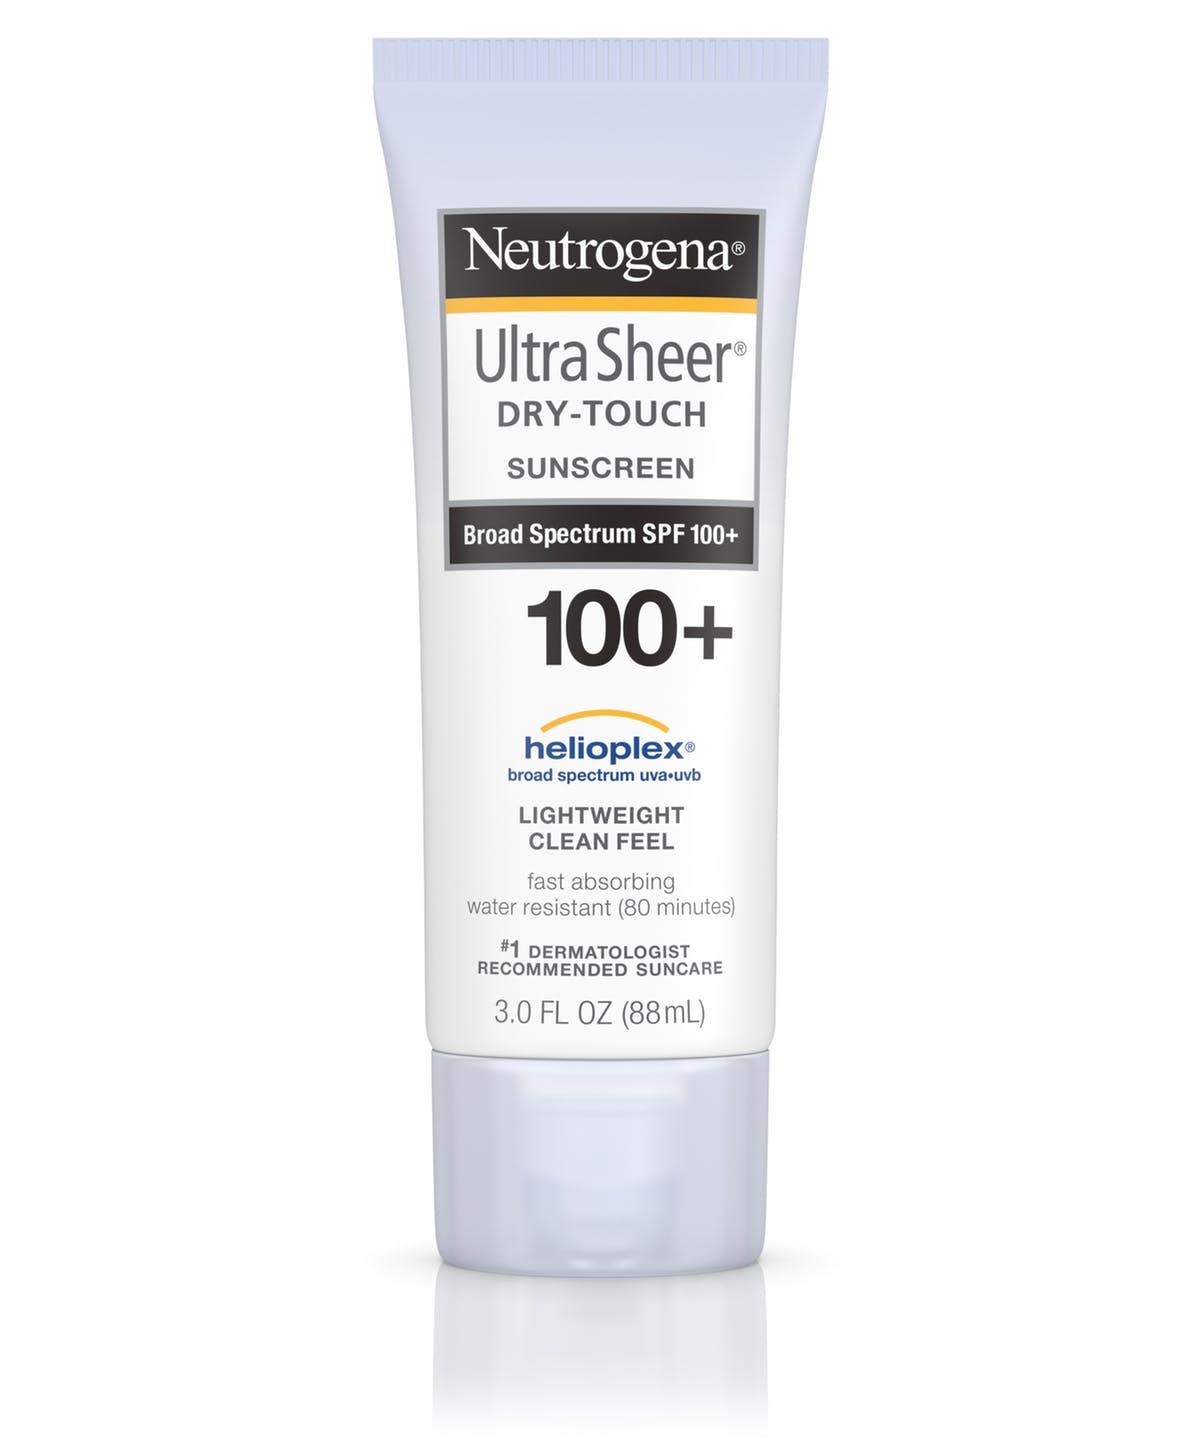 Neutrogena Ultra Sheer Dry Touch Sunscreen Broad Spectrum SPF 100+